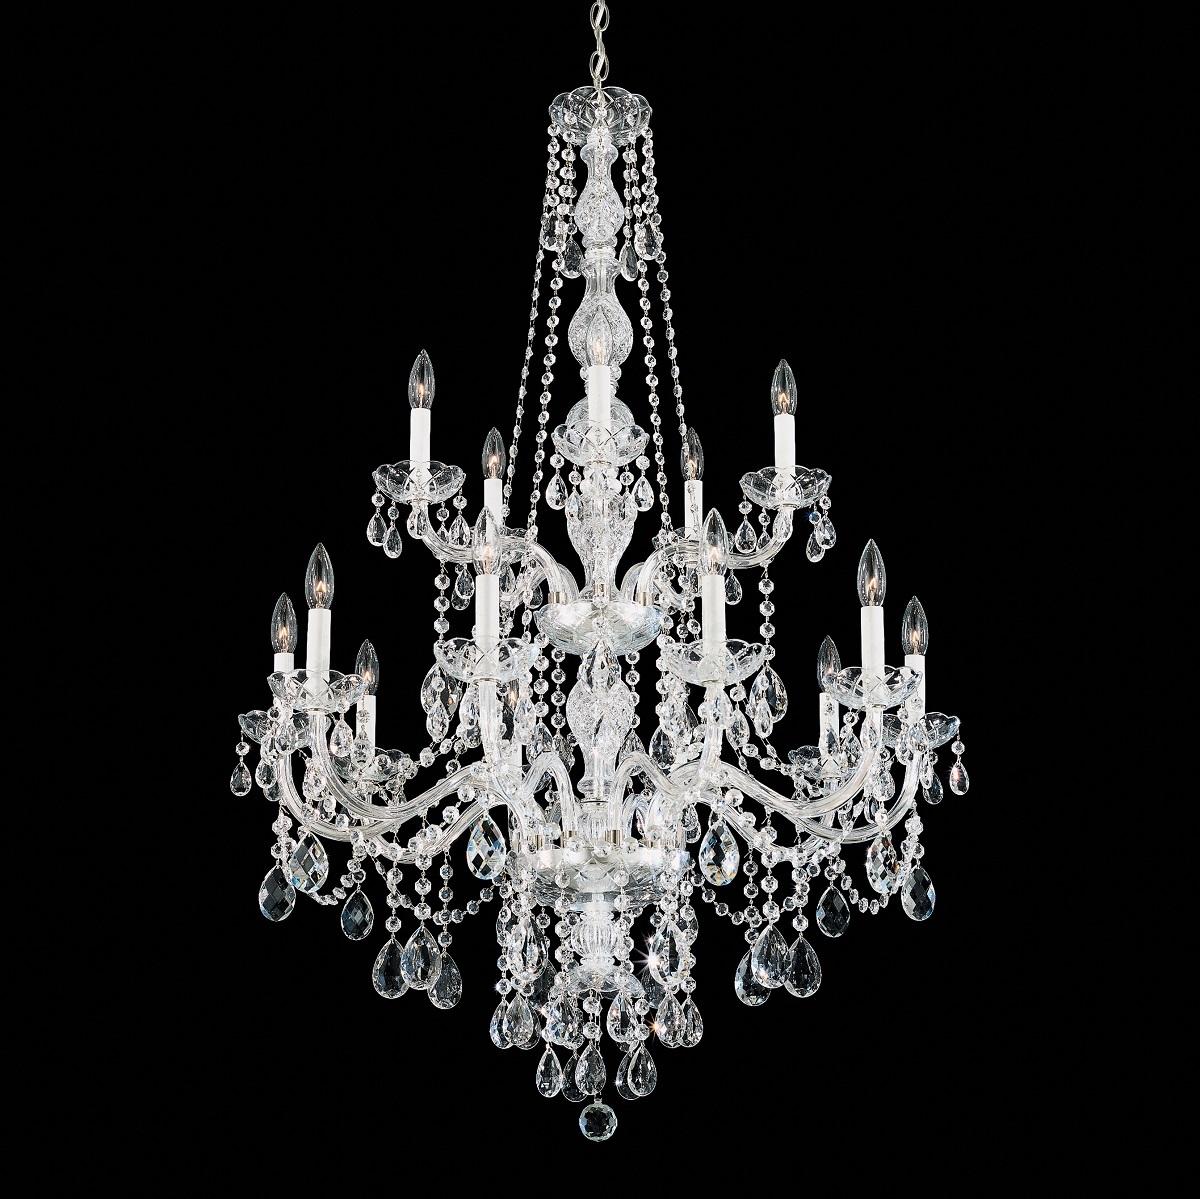 Schonbek Modern Crystal Chandelier Brooklyn,New York - Accentuations Brand